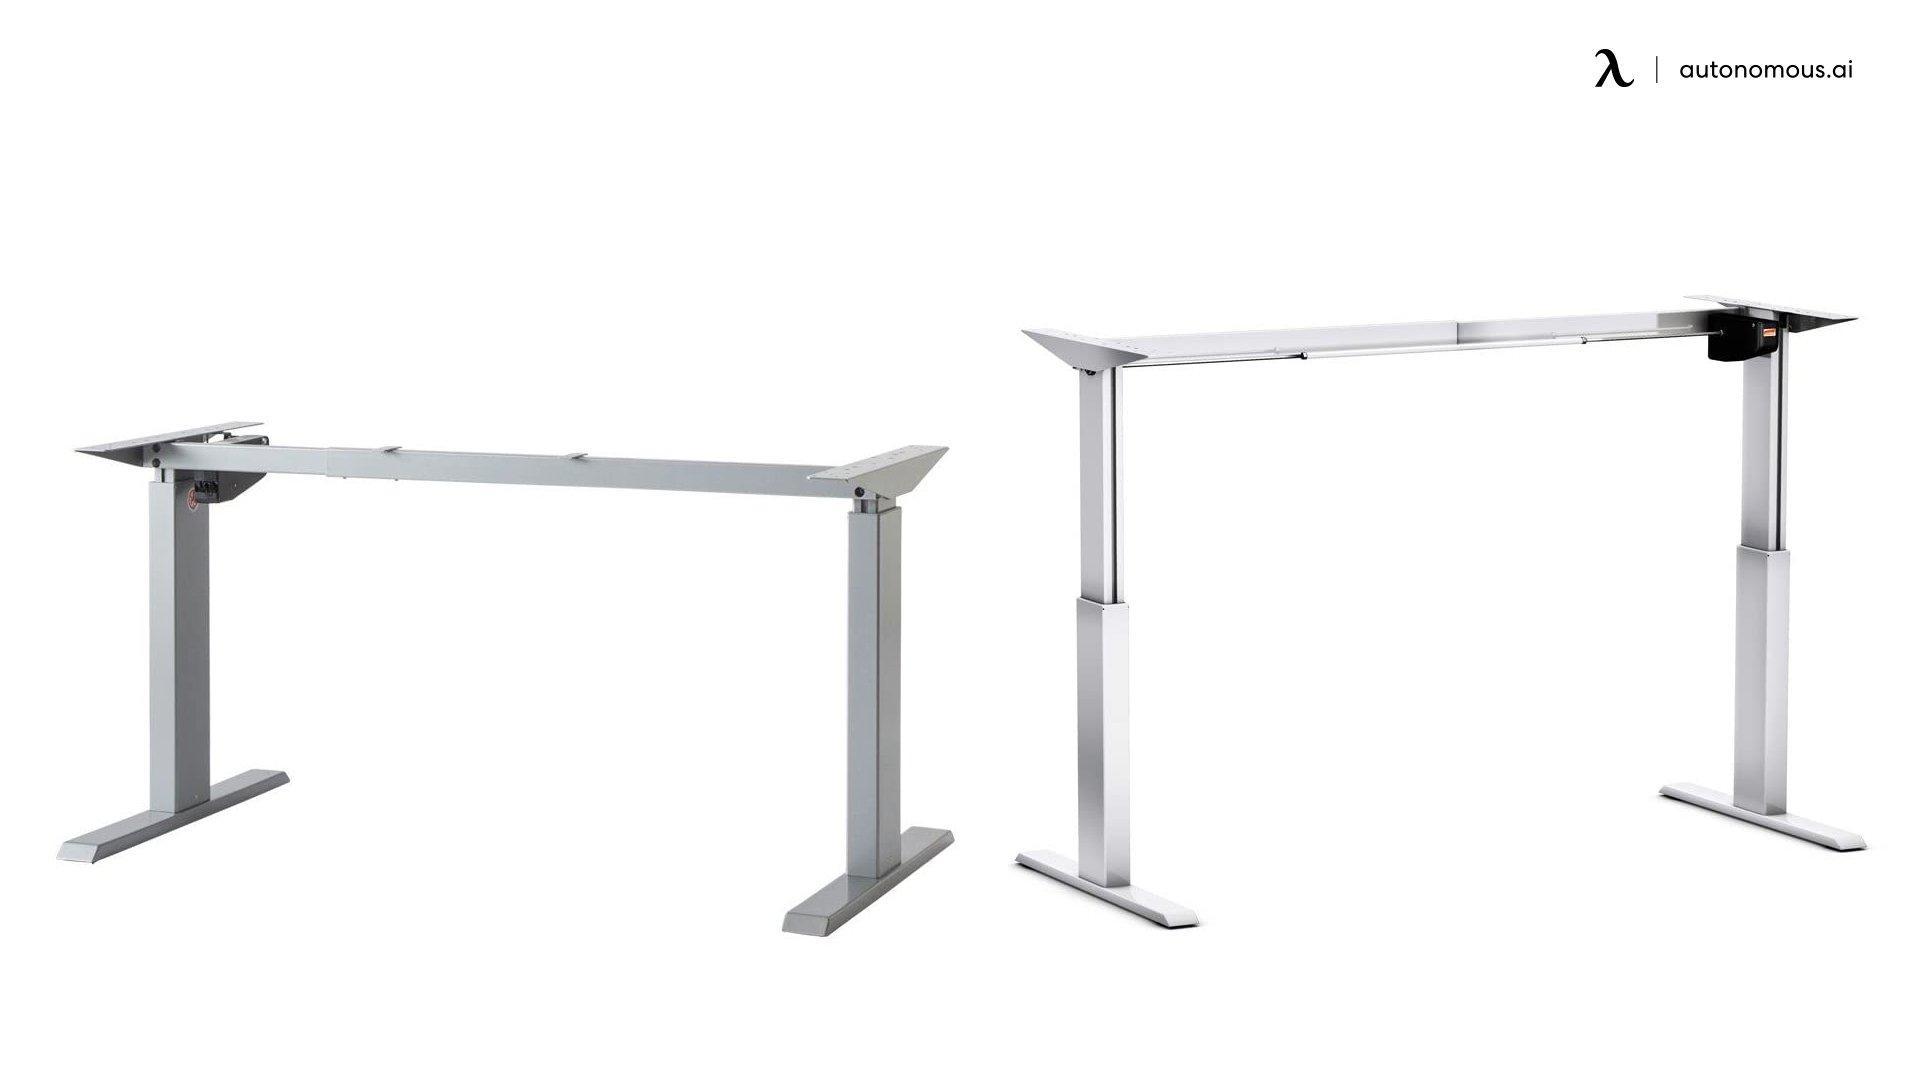 UpDown Desk Pro Series Electric Standing Desk Frame